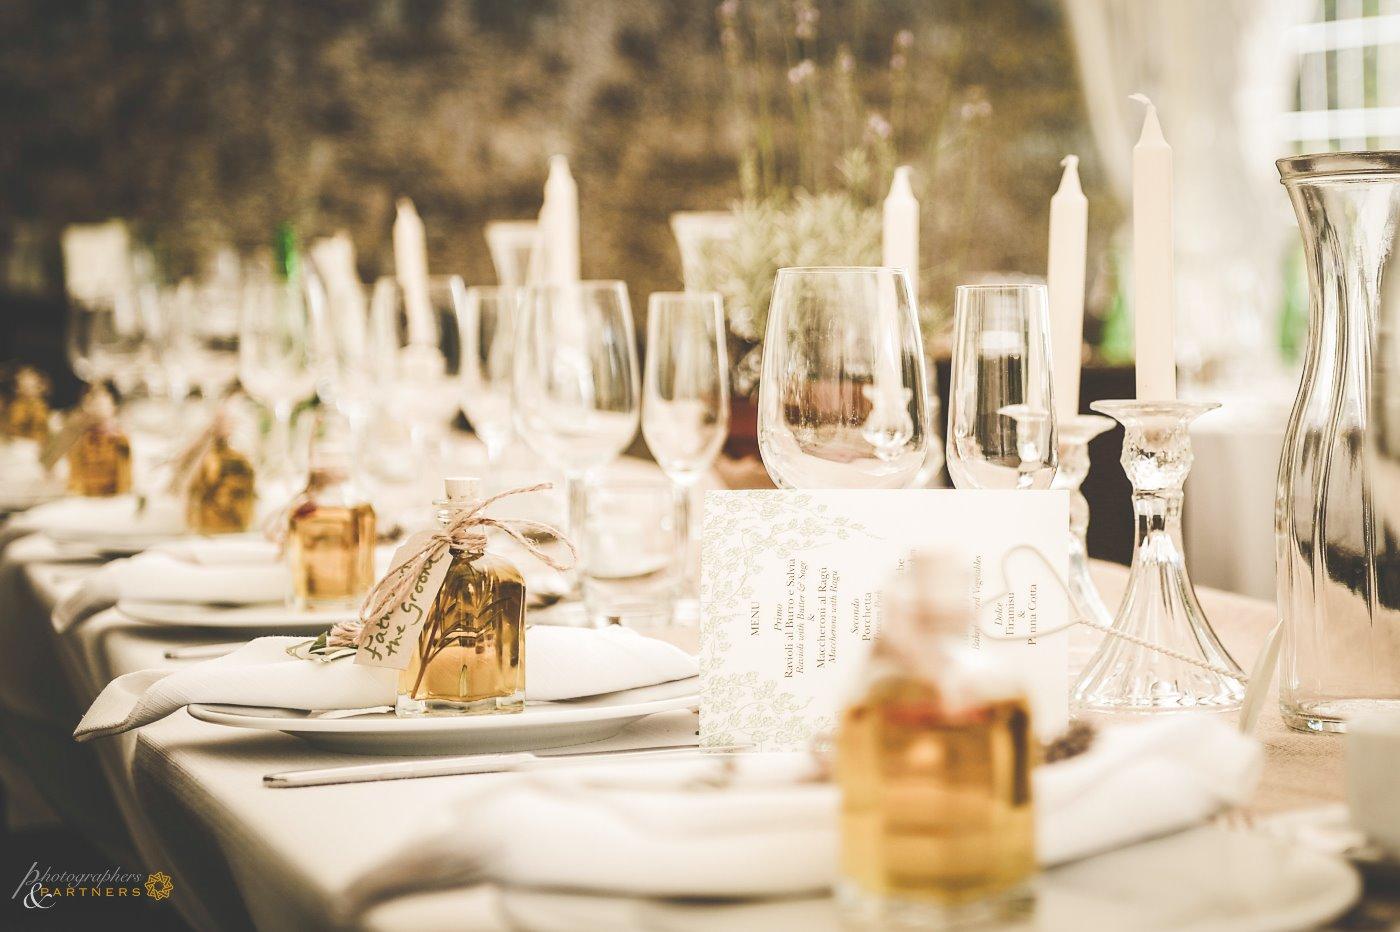 photography_weddings_bagni_lucca_17.jpg